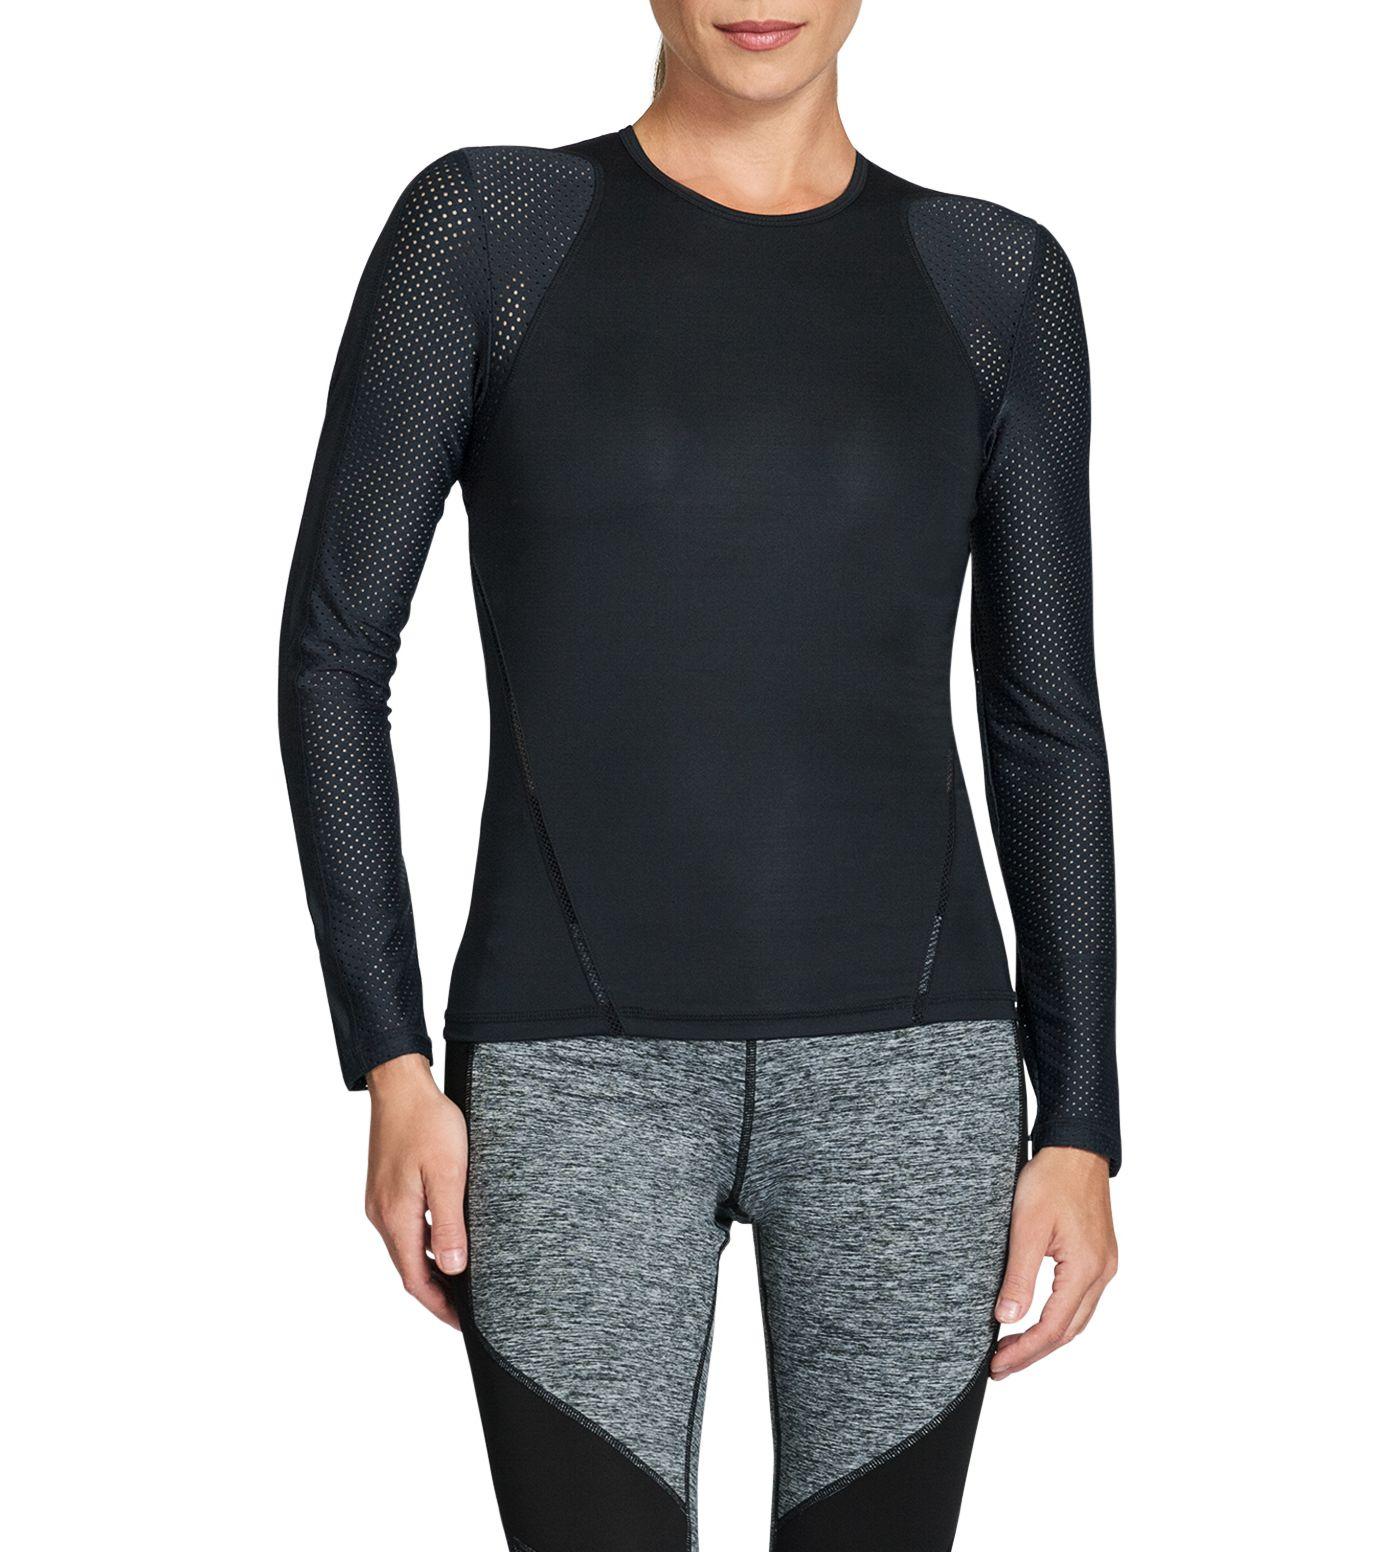 Tail Women's Orion Long Sleeve Tennis Shirt